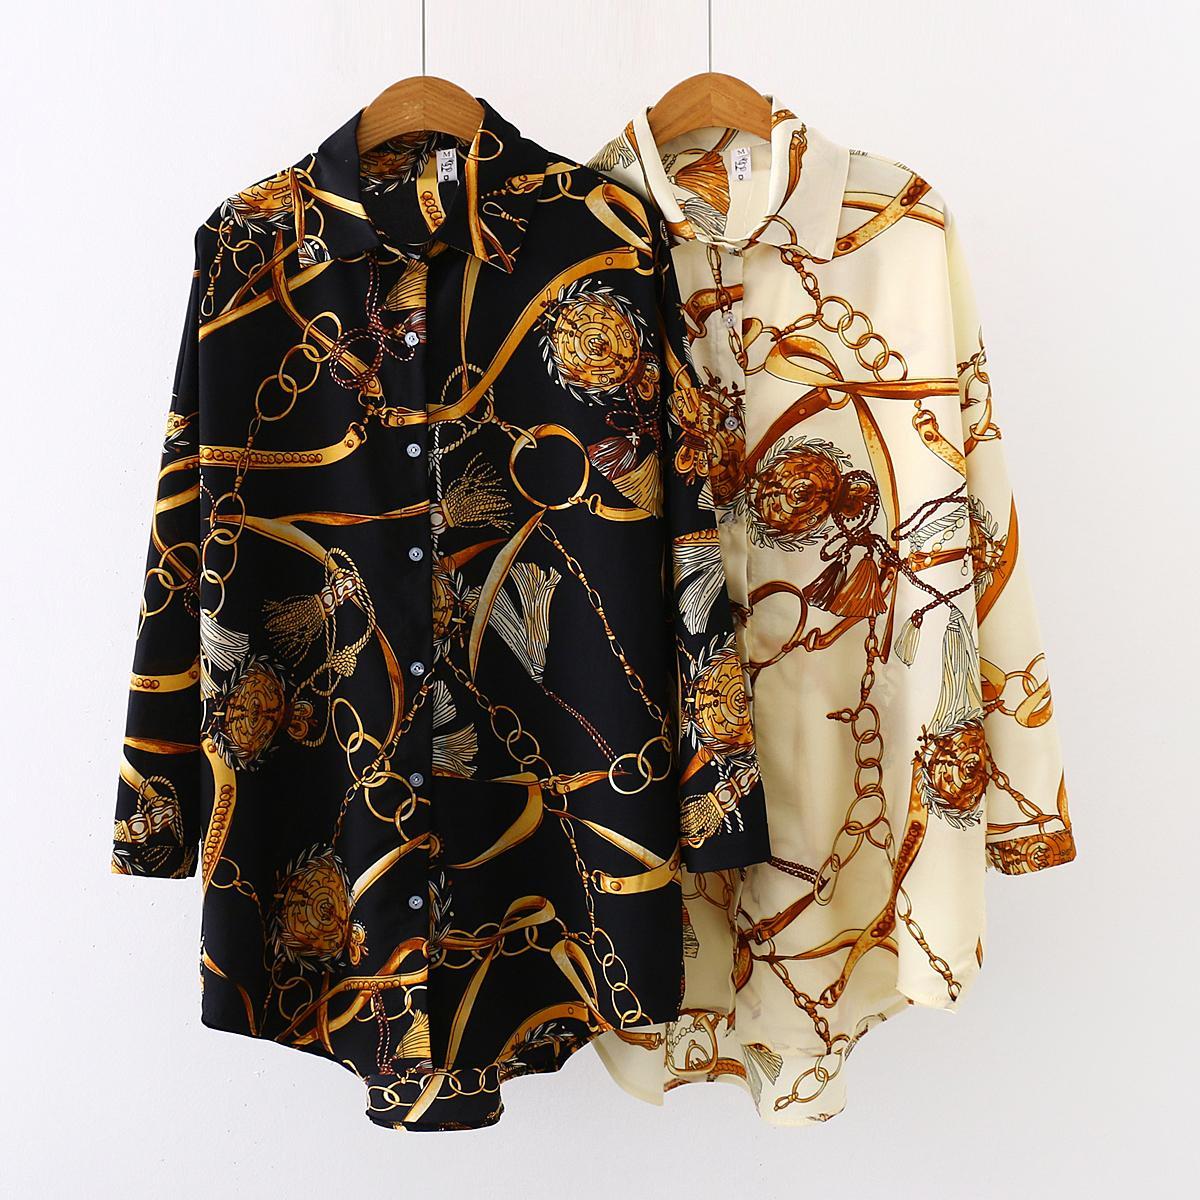 Plus size Fashion casual oversized Women Blouses 2020 Spring chiffon Blouse three quarter sleeve Loose Tops Shirts Blusas Mujer(China)